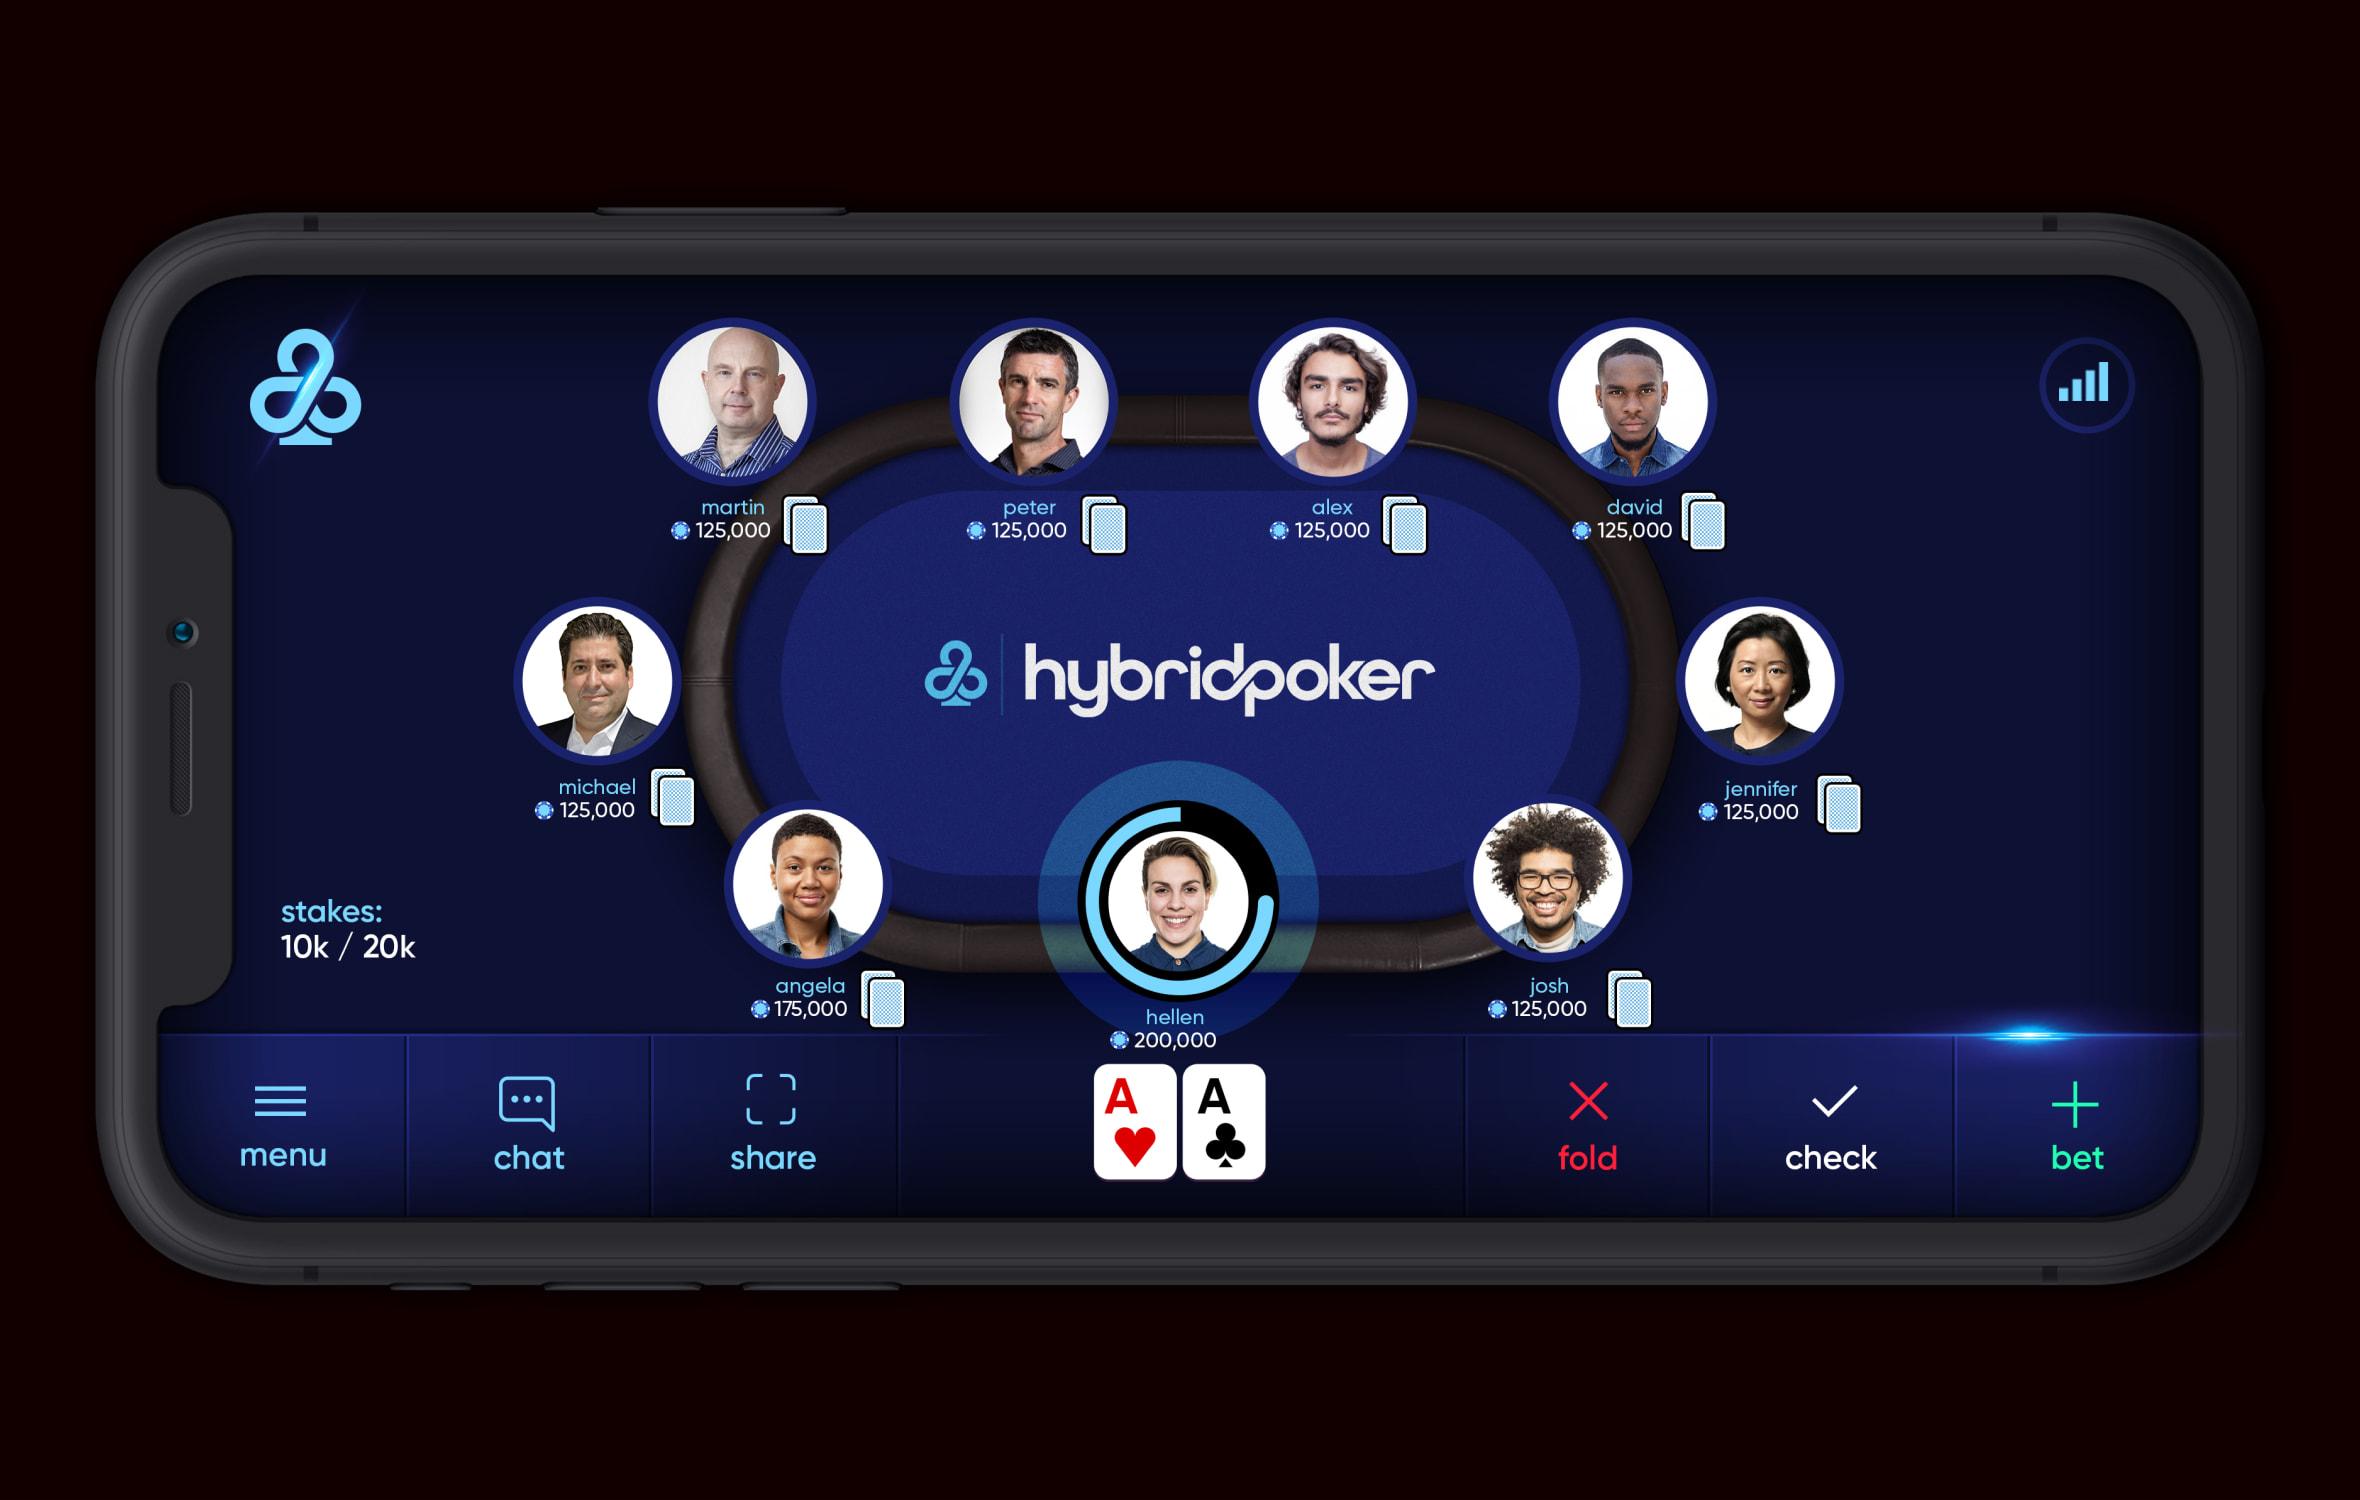 hybrid poker app screen mockup